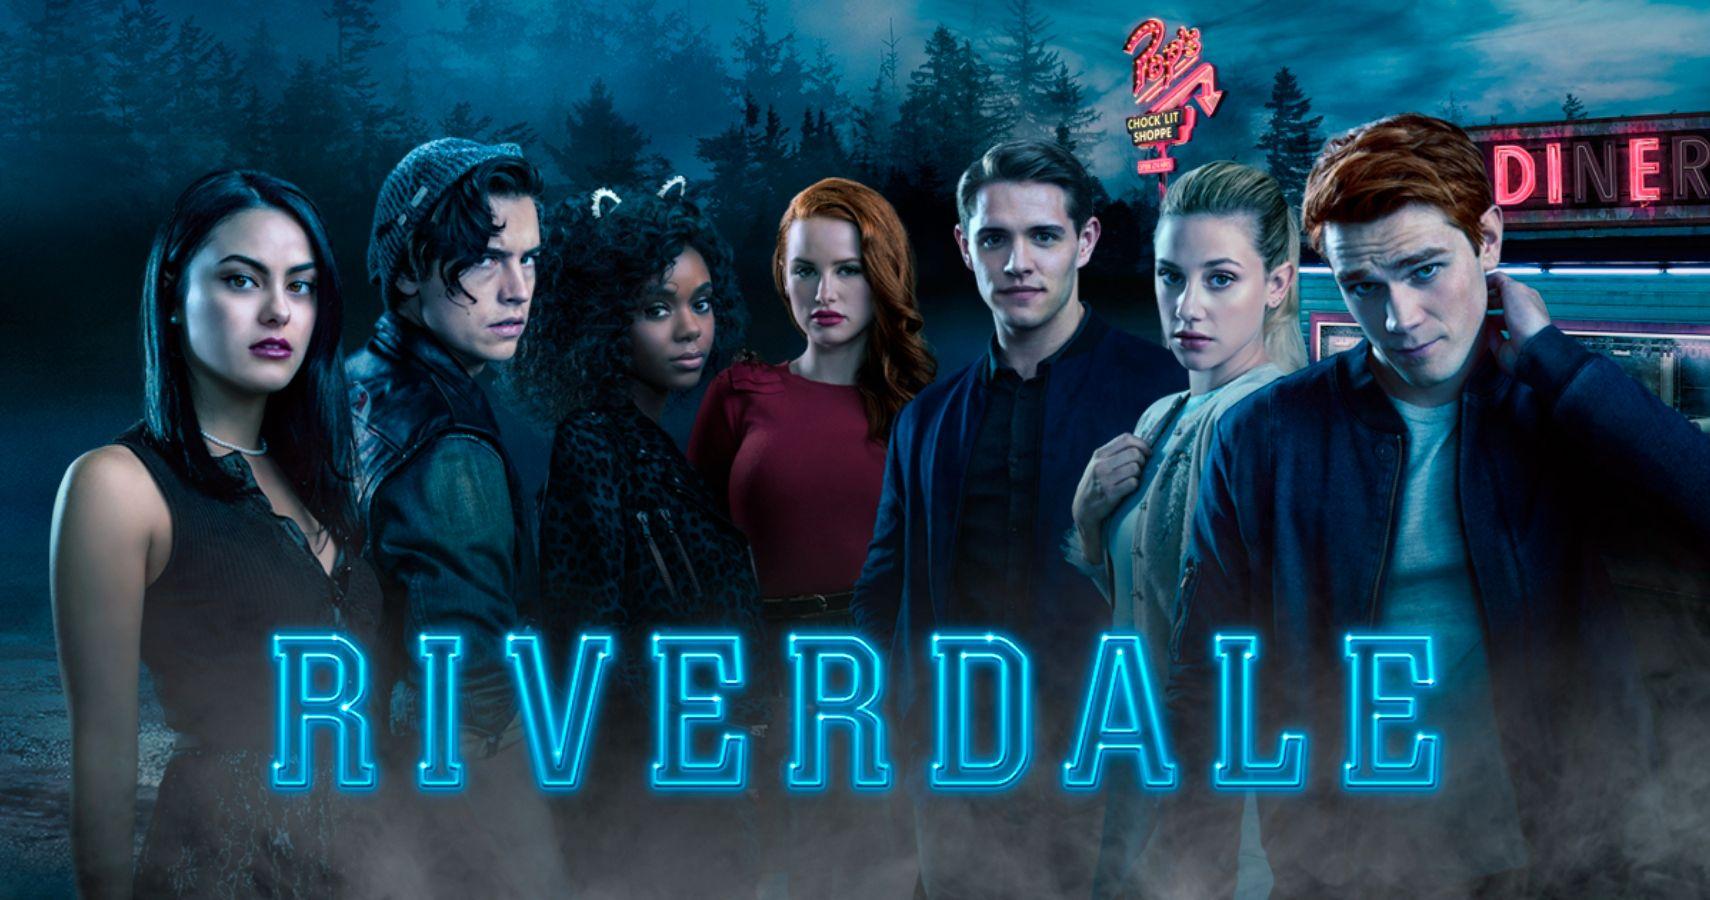 http://exposedsub.ir/دانلود-سریال-جنایی-Riverdale.html